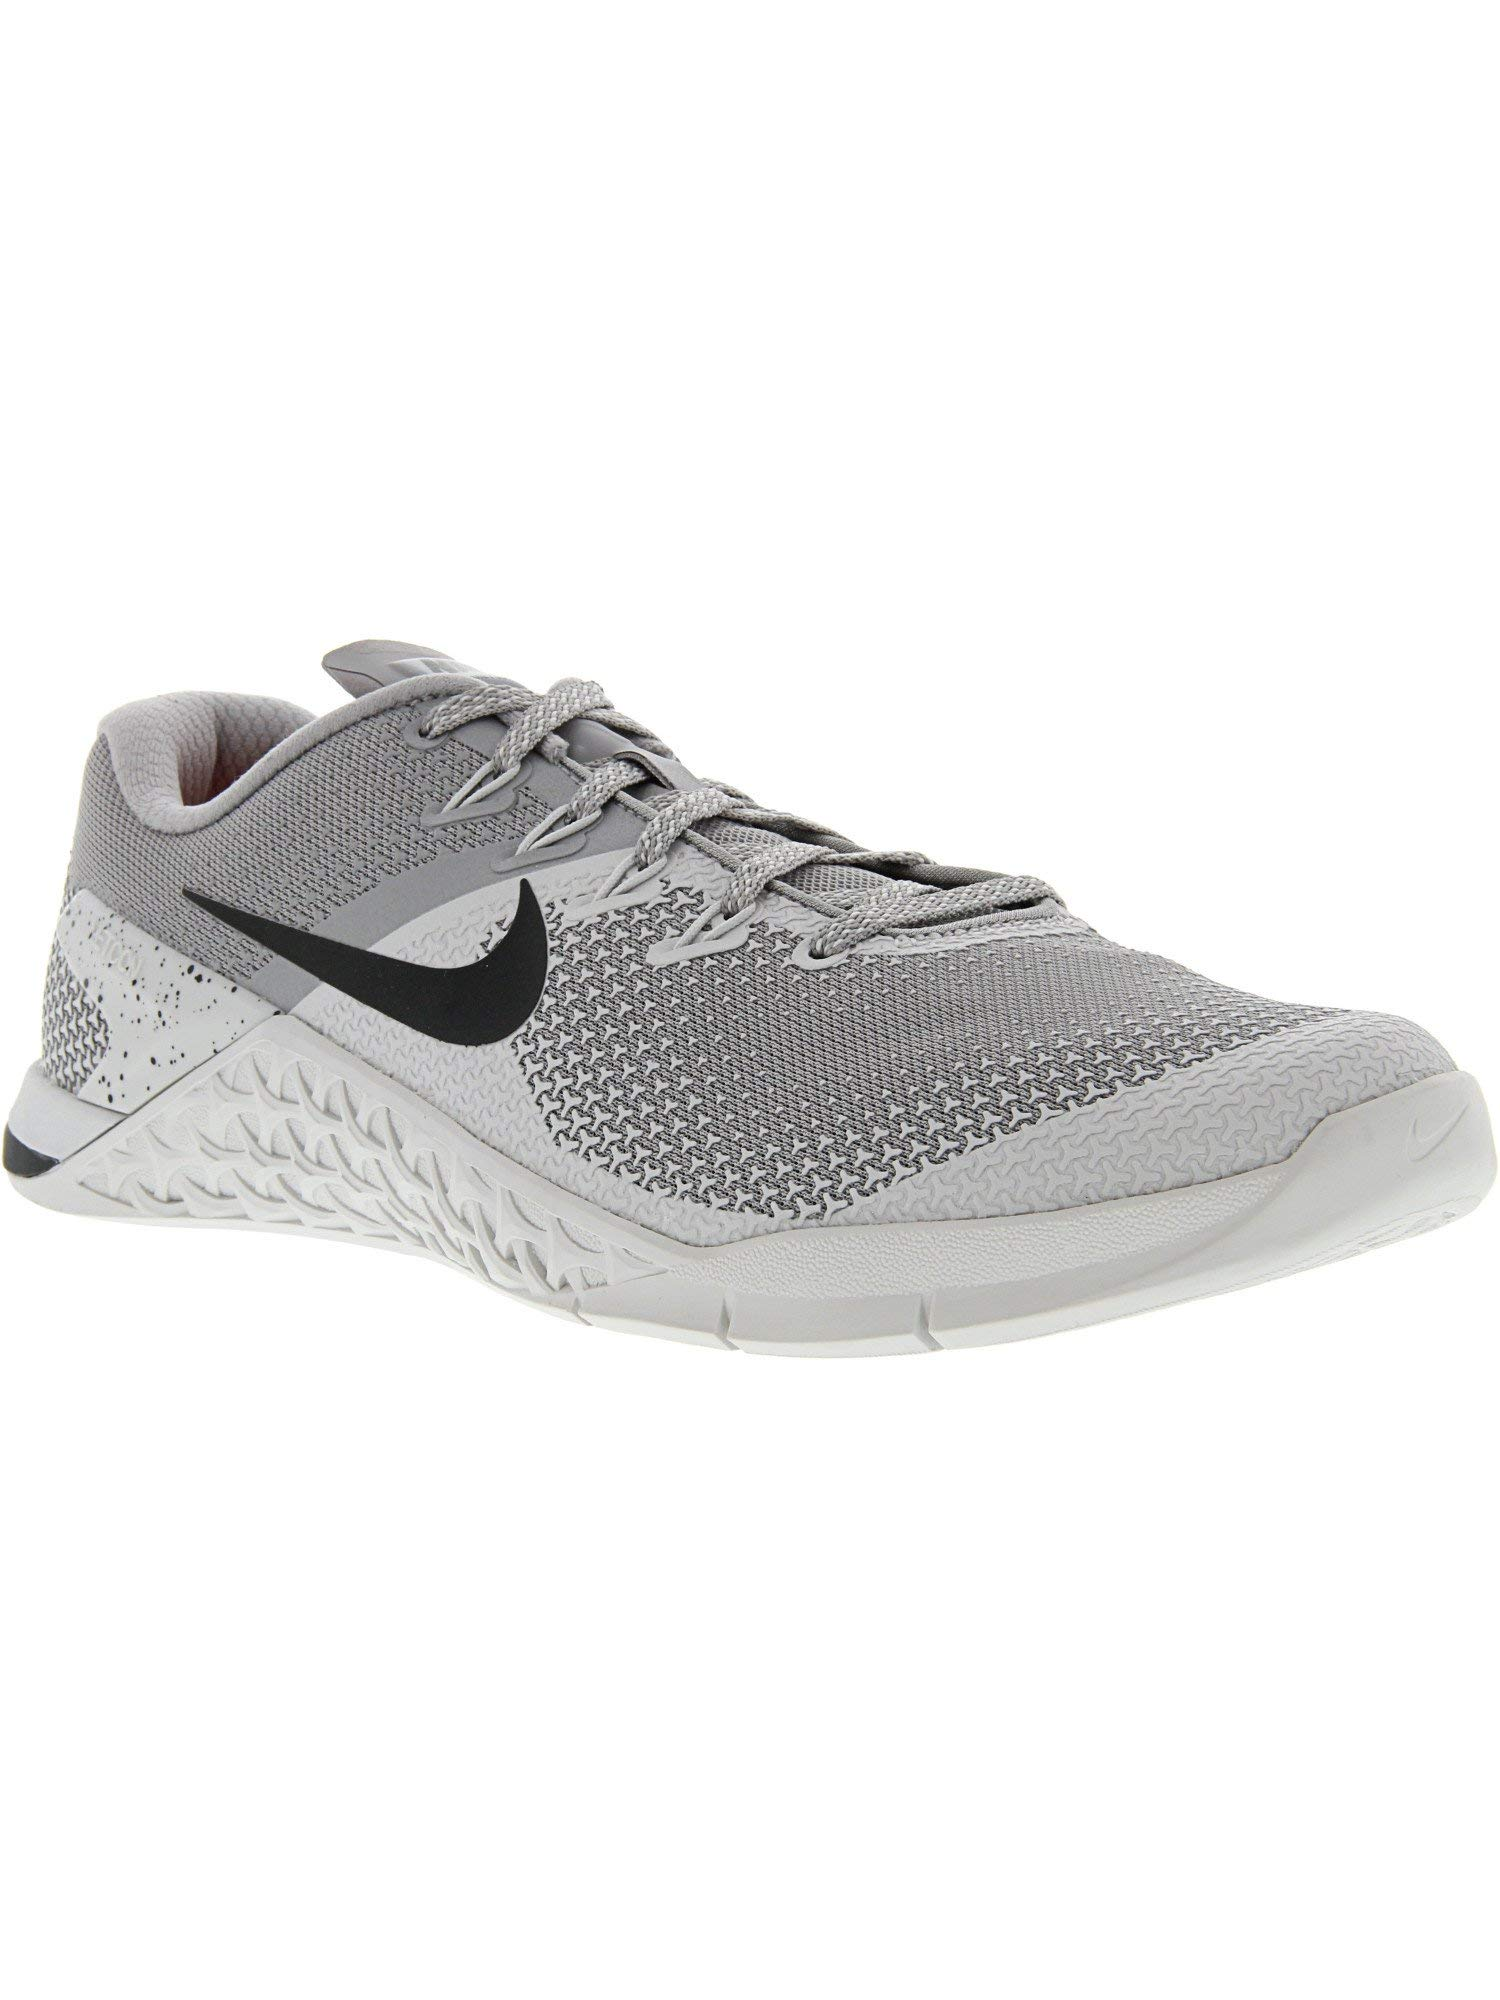 Nike Men's Metcon 4 Atmosphere Grey/Black Ankle-High Cross Trainer Shoe - 6.5M by Nike (Image #3)